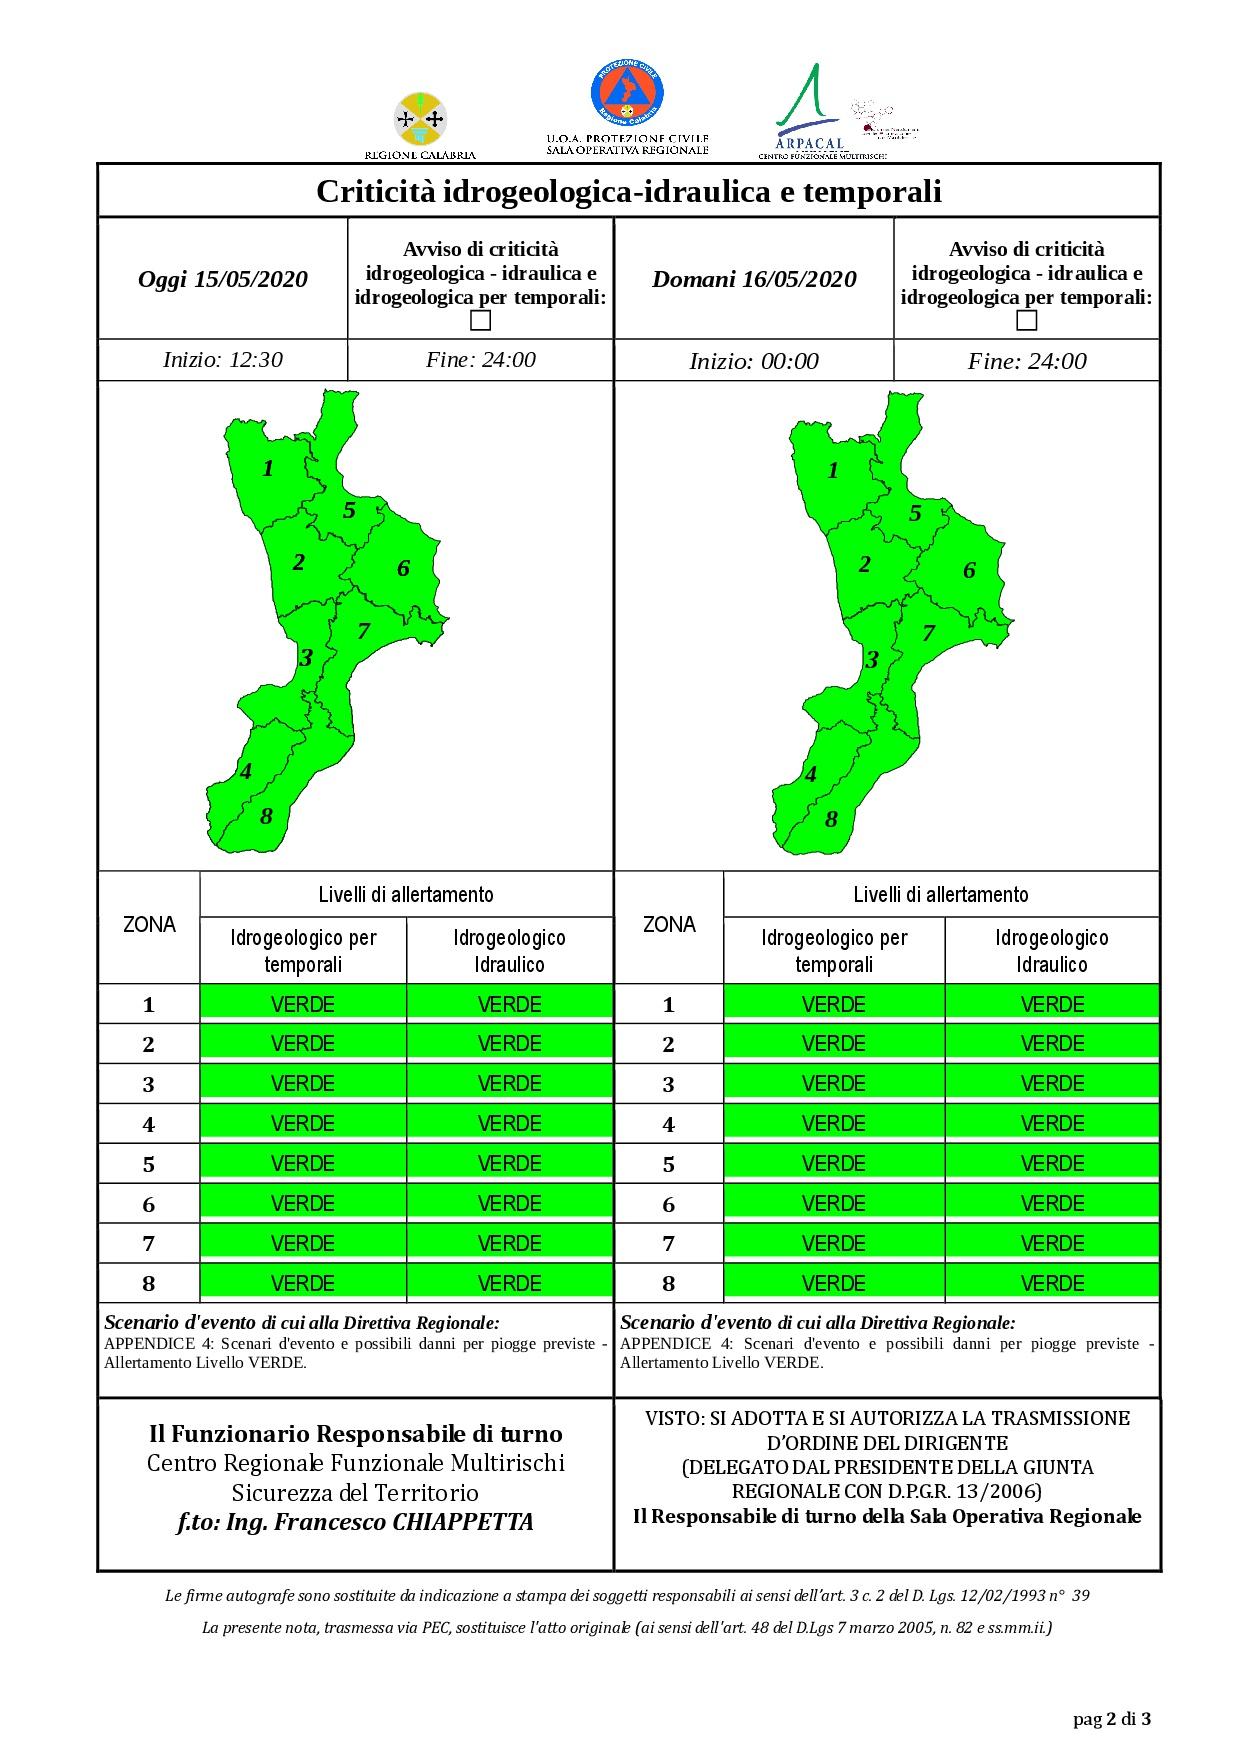 Criticità idrogeologica-idraulica e temporali in Calabria 15-05-2020